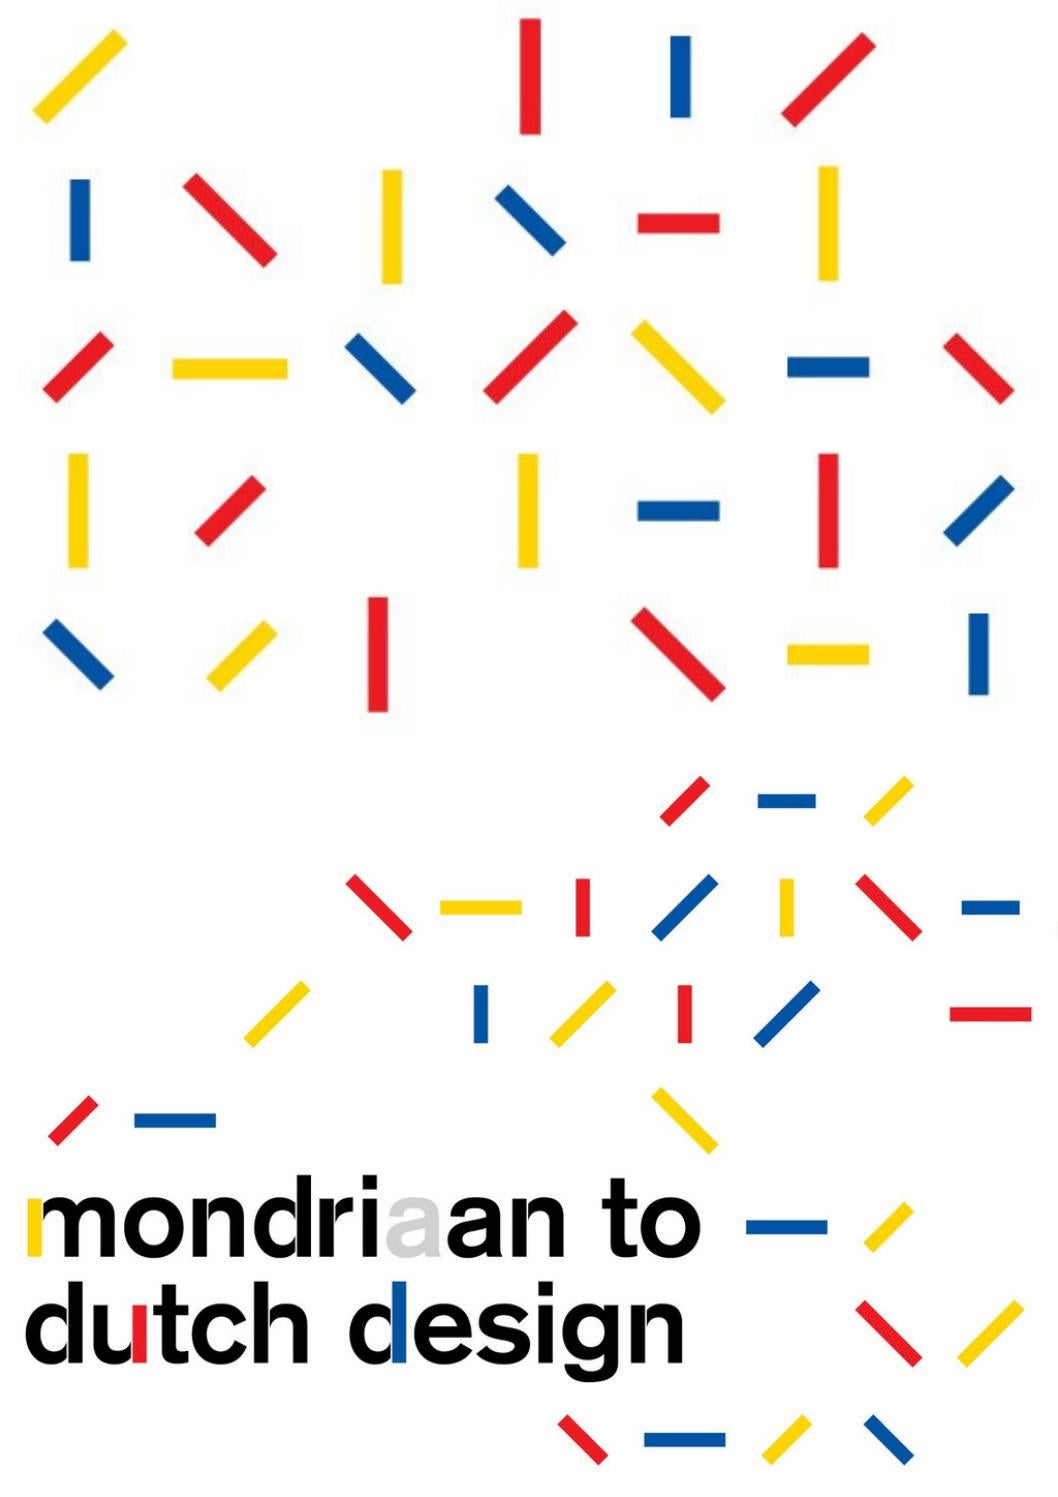 Dutch Nbtc Marketing 2 Mondrian Design By Issuu To Term Holland mNOP8yvn0w